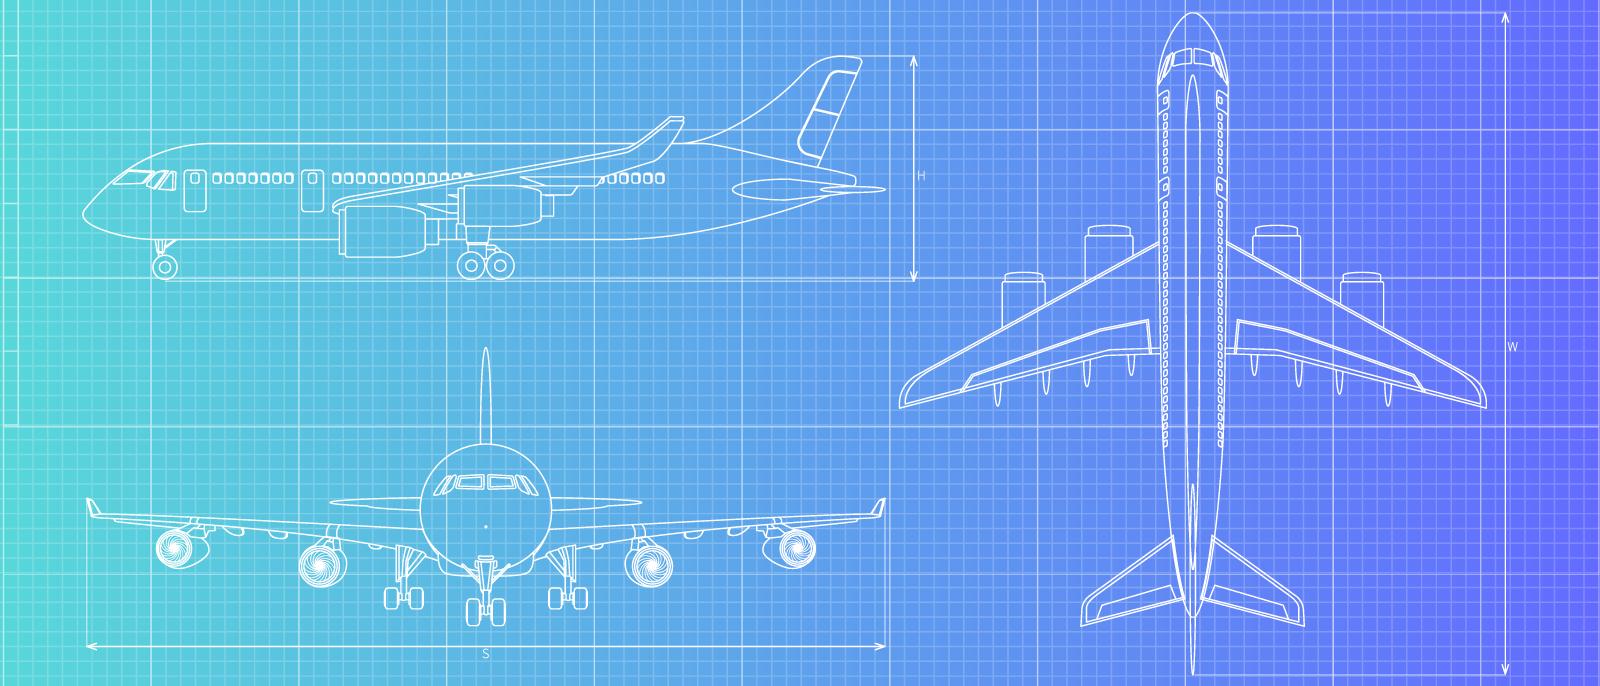 Building an Image Classifier with Google Cloud AutoML Vision: Part 3